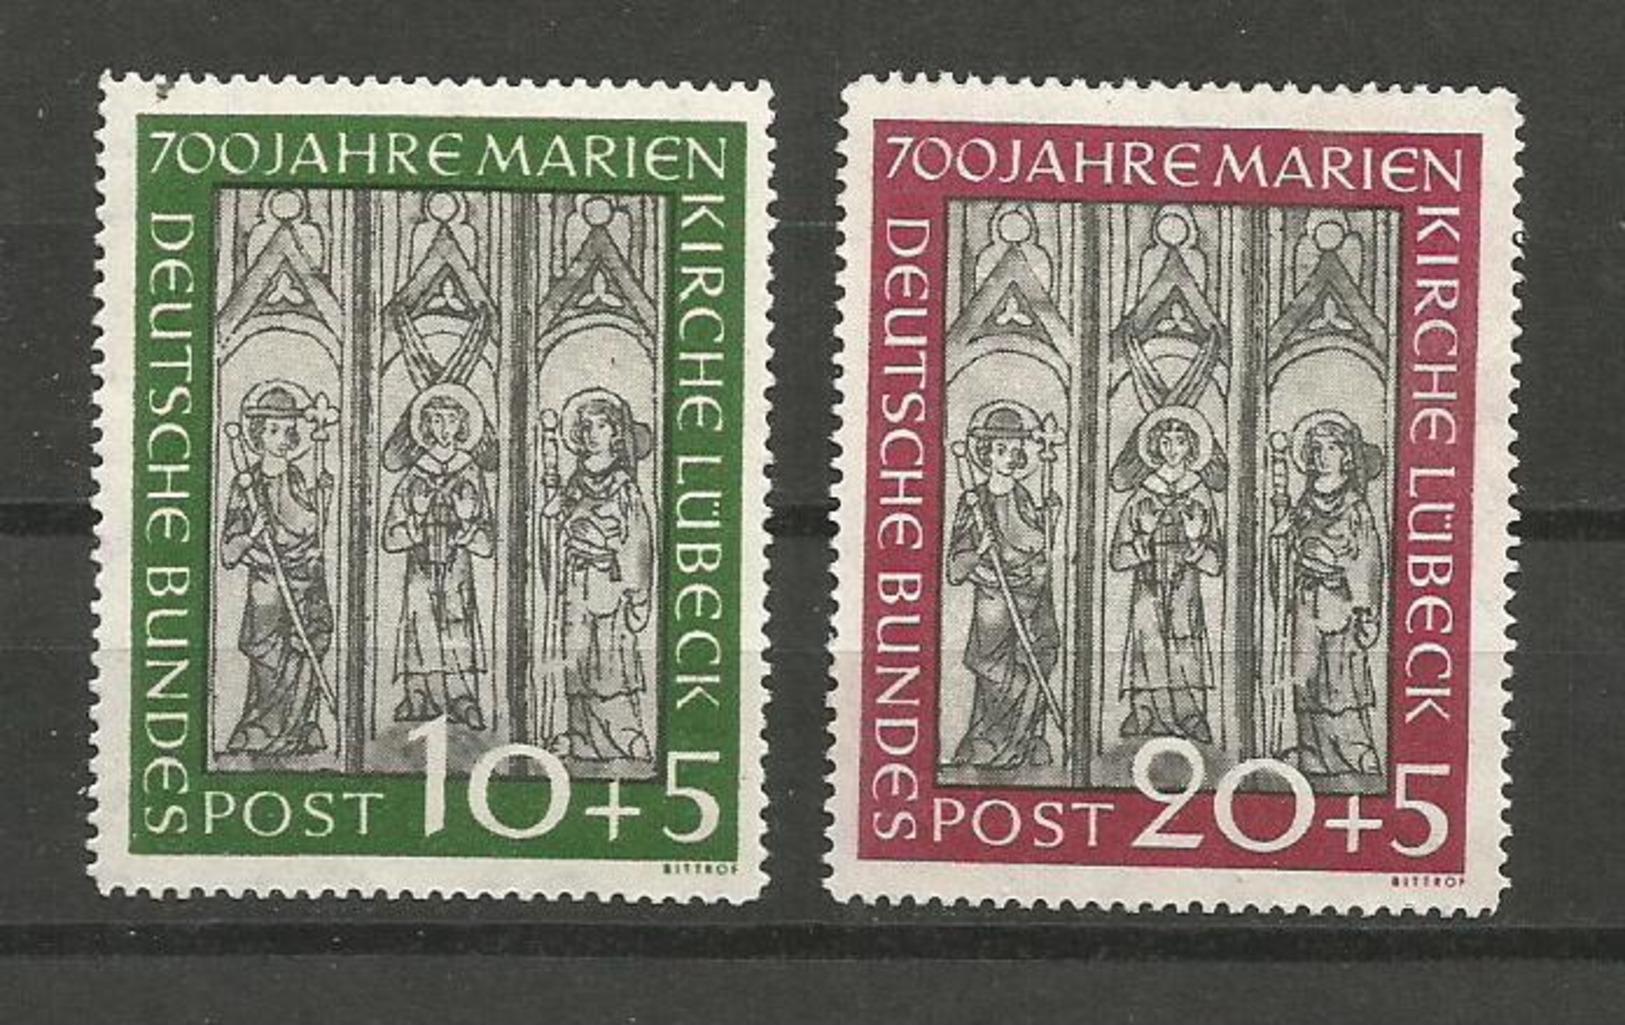 GERMANY DEUTSCHLAND 1951 700 JAHRE MARIEN KIRCHE LUBECK 700th Anniversary Marie Church UNUSED - Ongebruikt